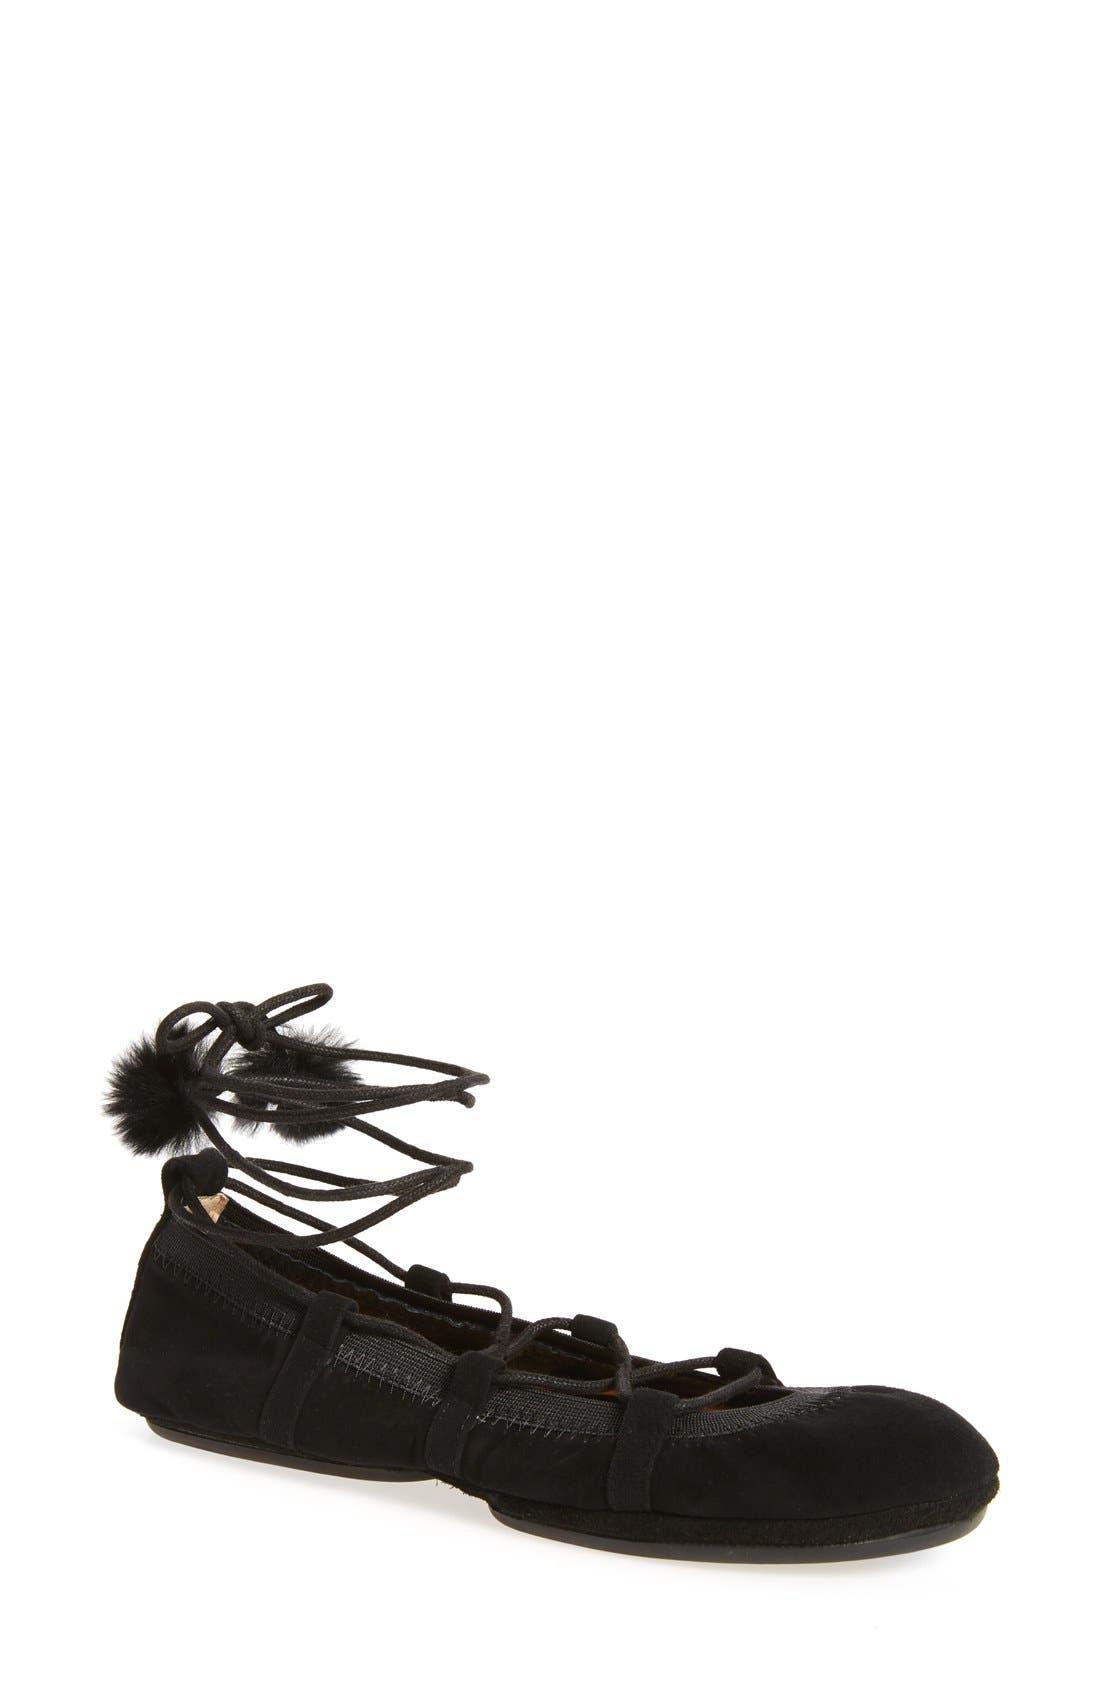 Alternate Image 1 Selected - Yosi Samra Seleste Foldable Ballet Flat (Women)